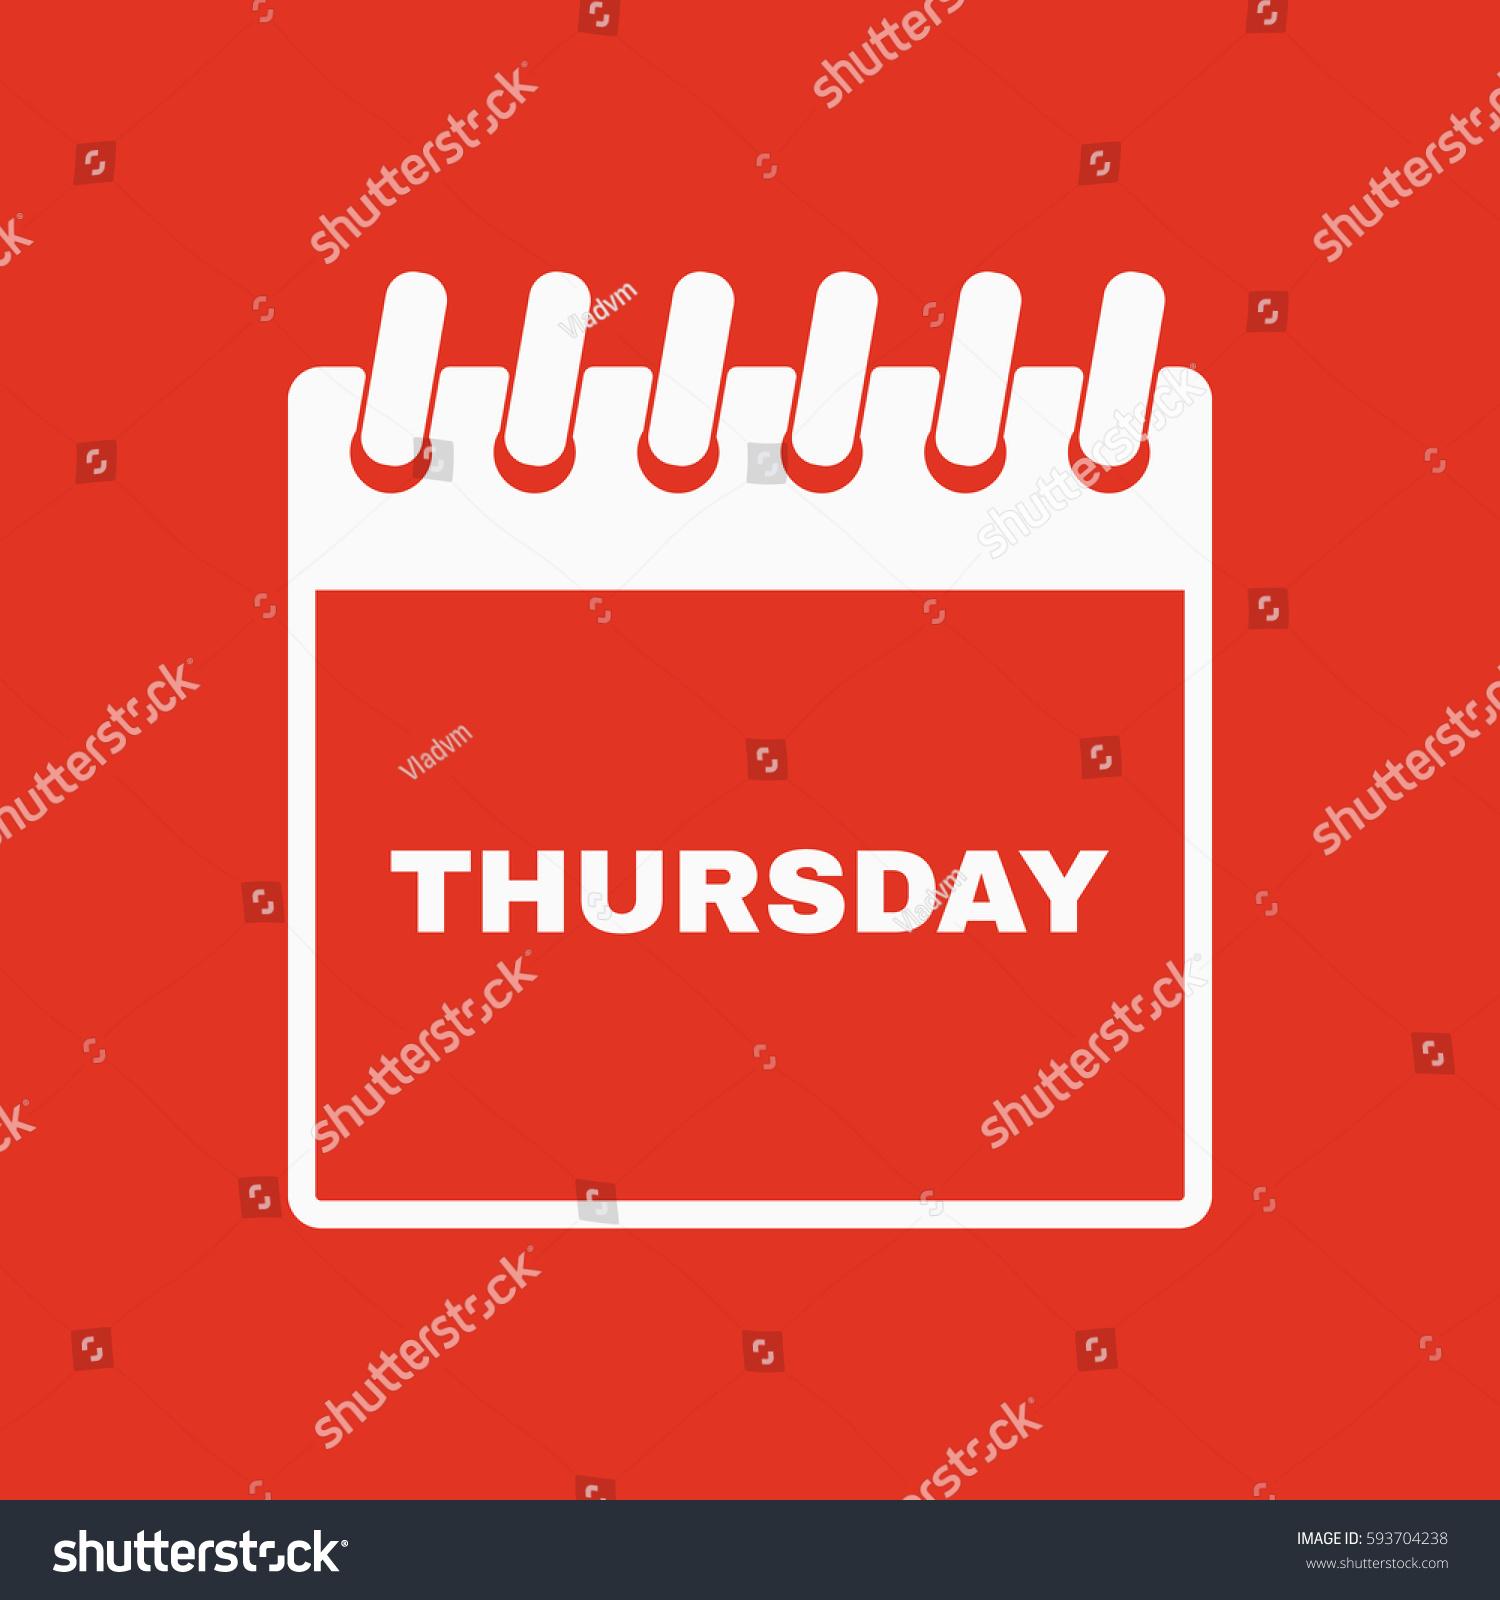 Thursday icon thu calendar data symbol stock vector 593704238 thu and calendar data symbol flat design stock vector biocorpaavc